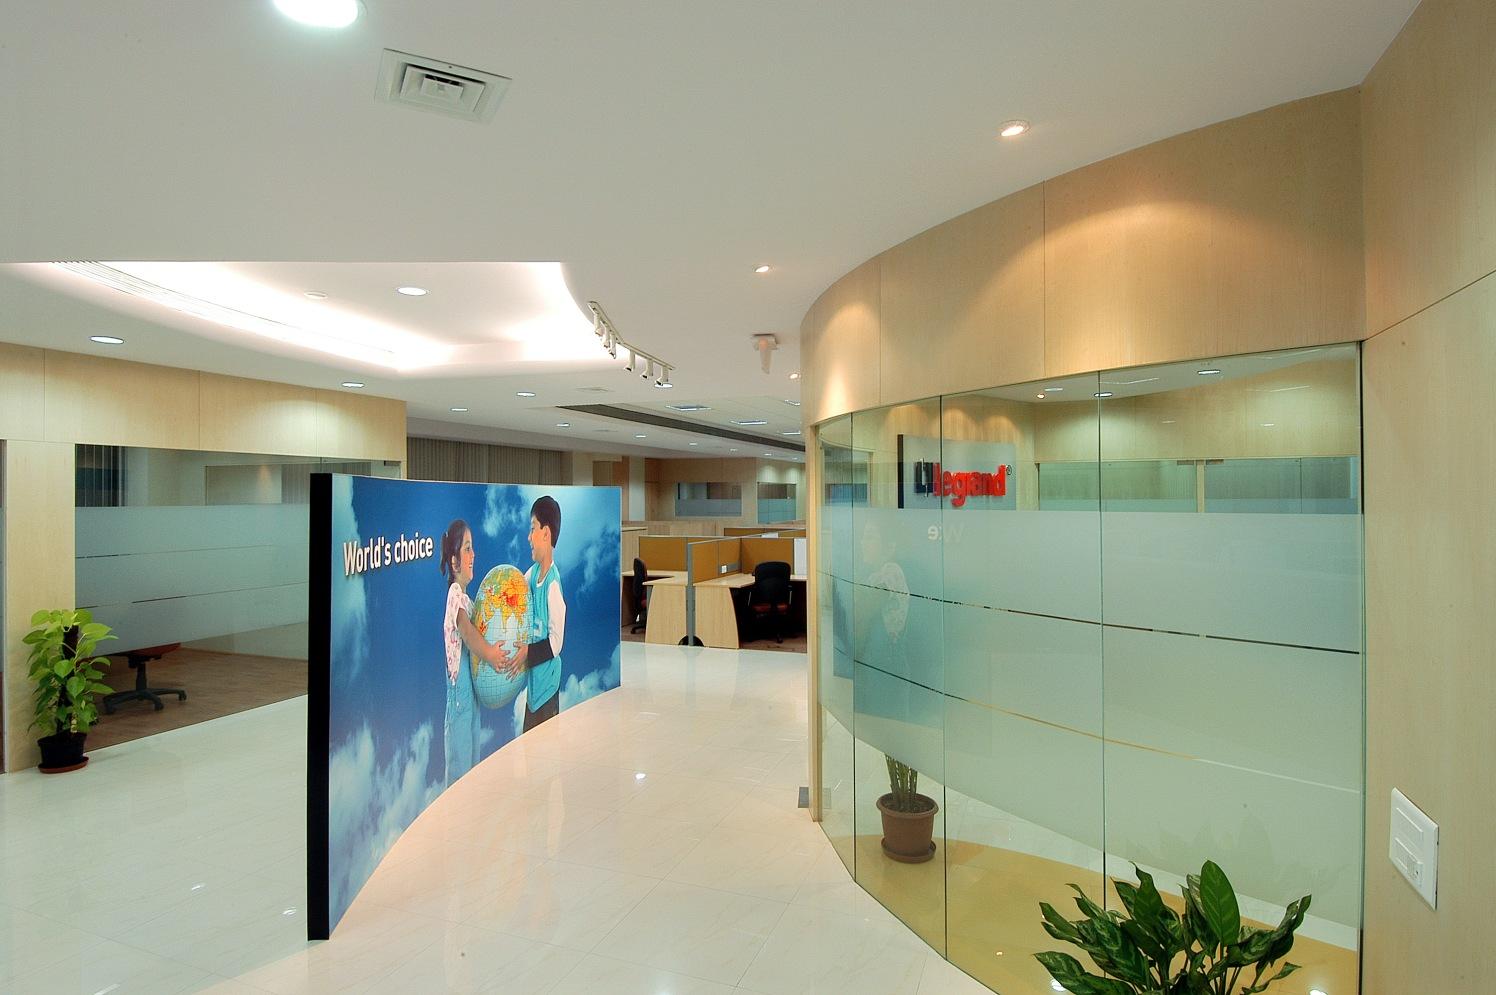 Office Entrance by Amin Sha Modern | Interior Design Photos & Ideas